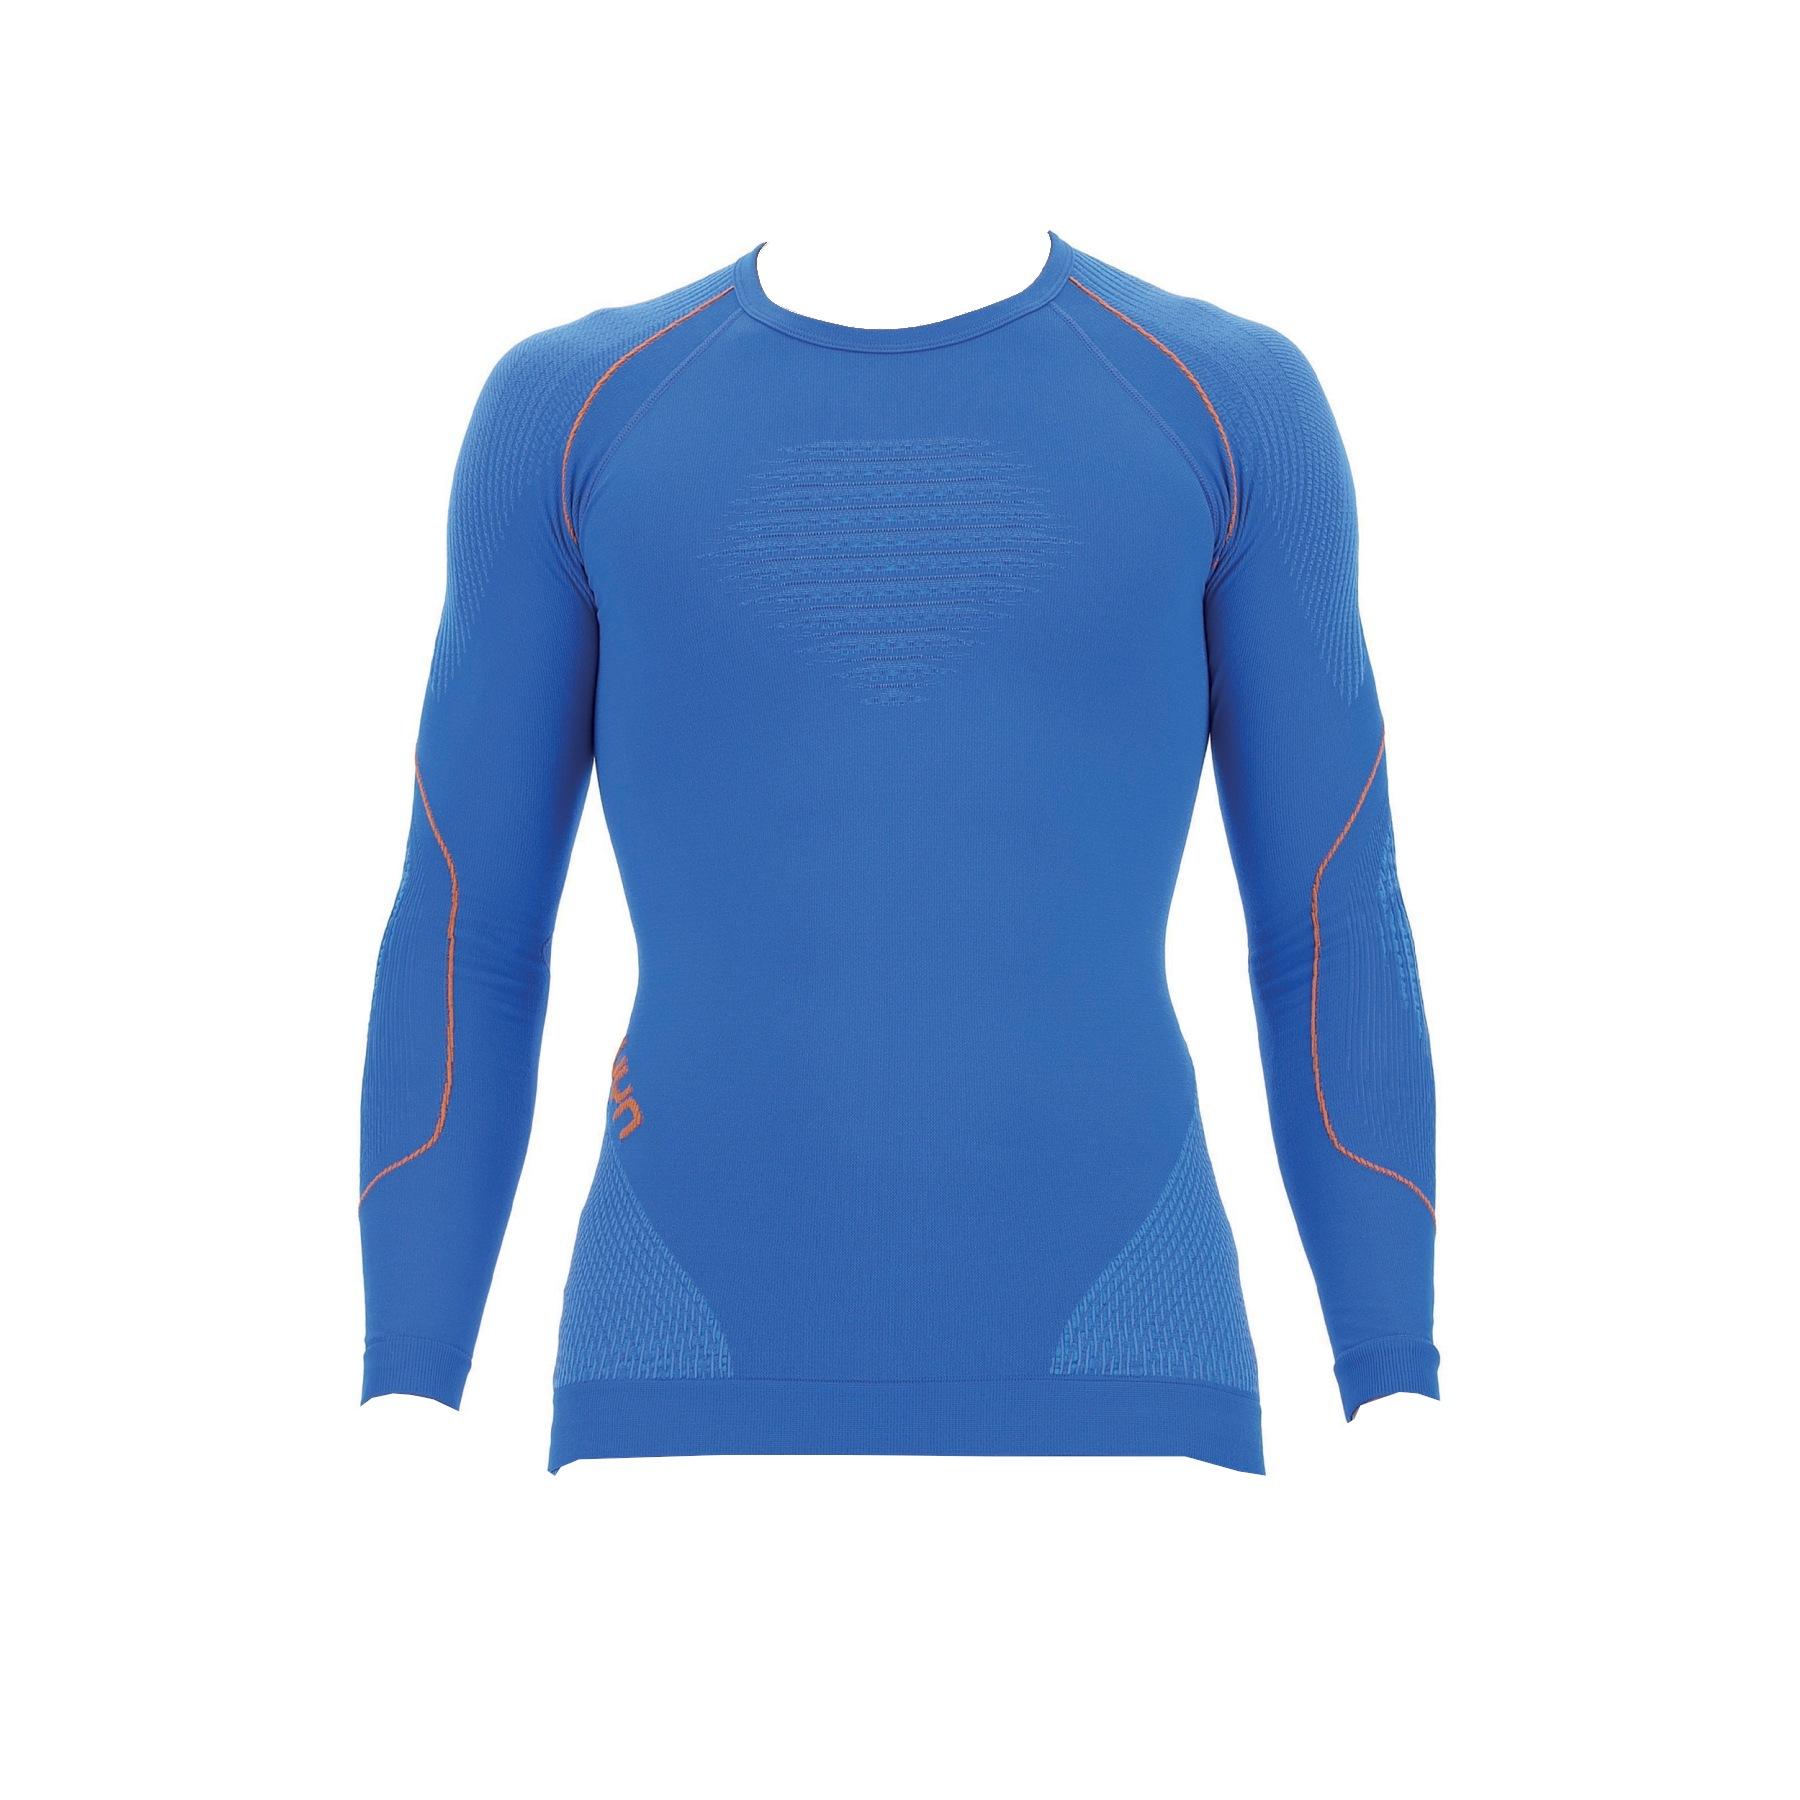 UYN Evolutyon Longsleeve Shirt - Lapis Blue/Blue/Orange Shiny